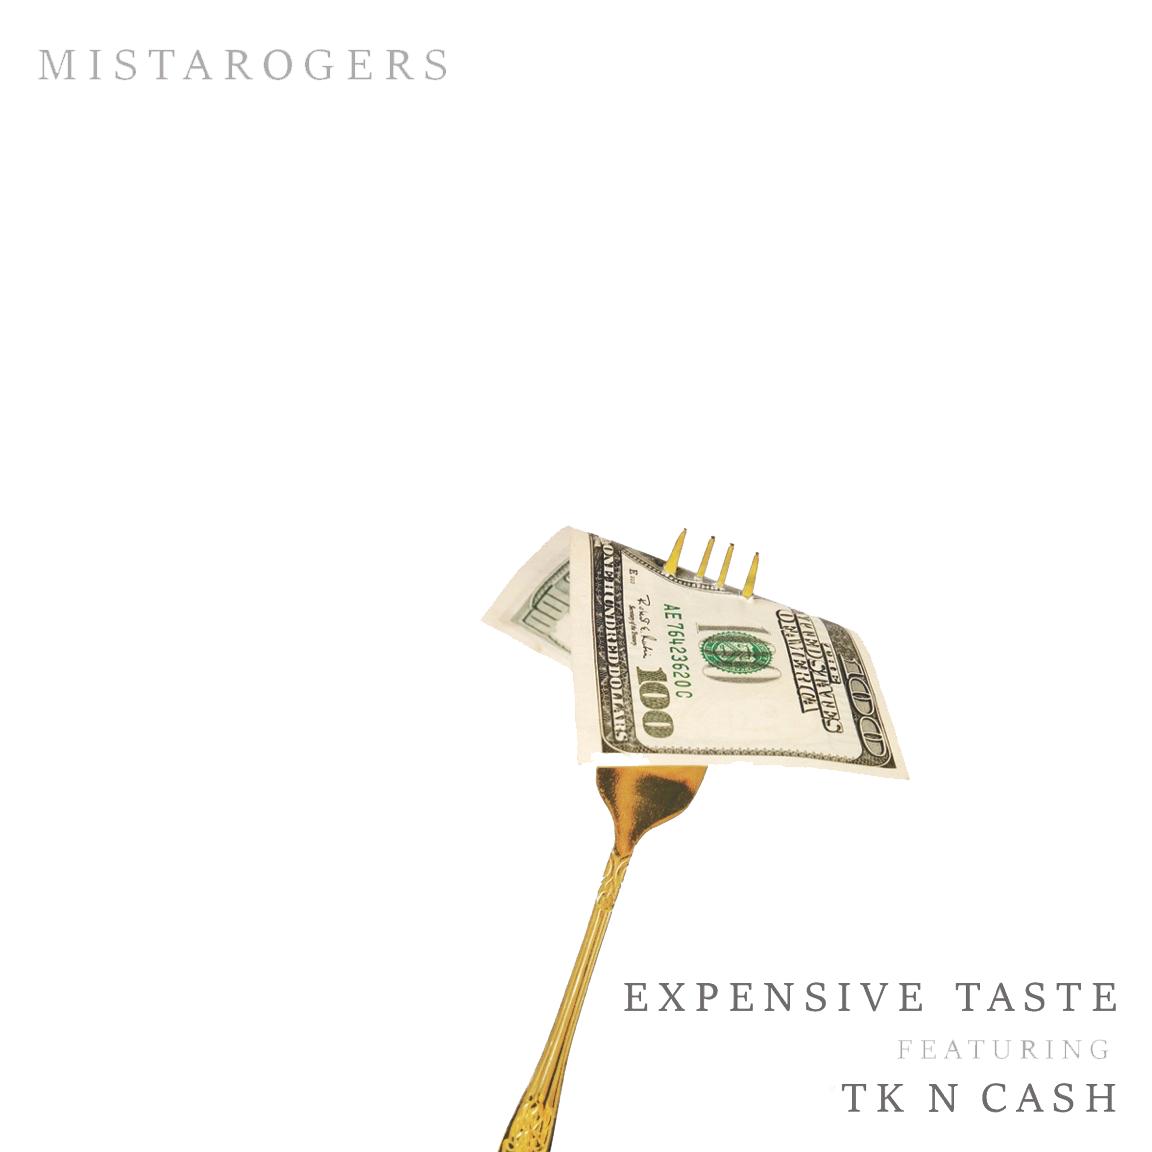 "MistaRogersGrabsTMandTKNCASHFor""ExpensiveTaste"""